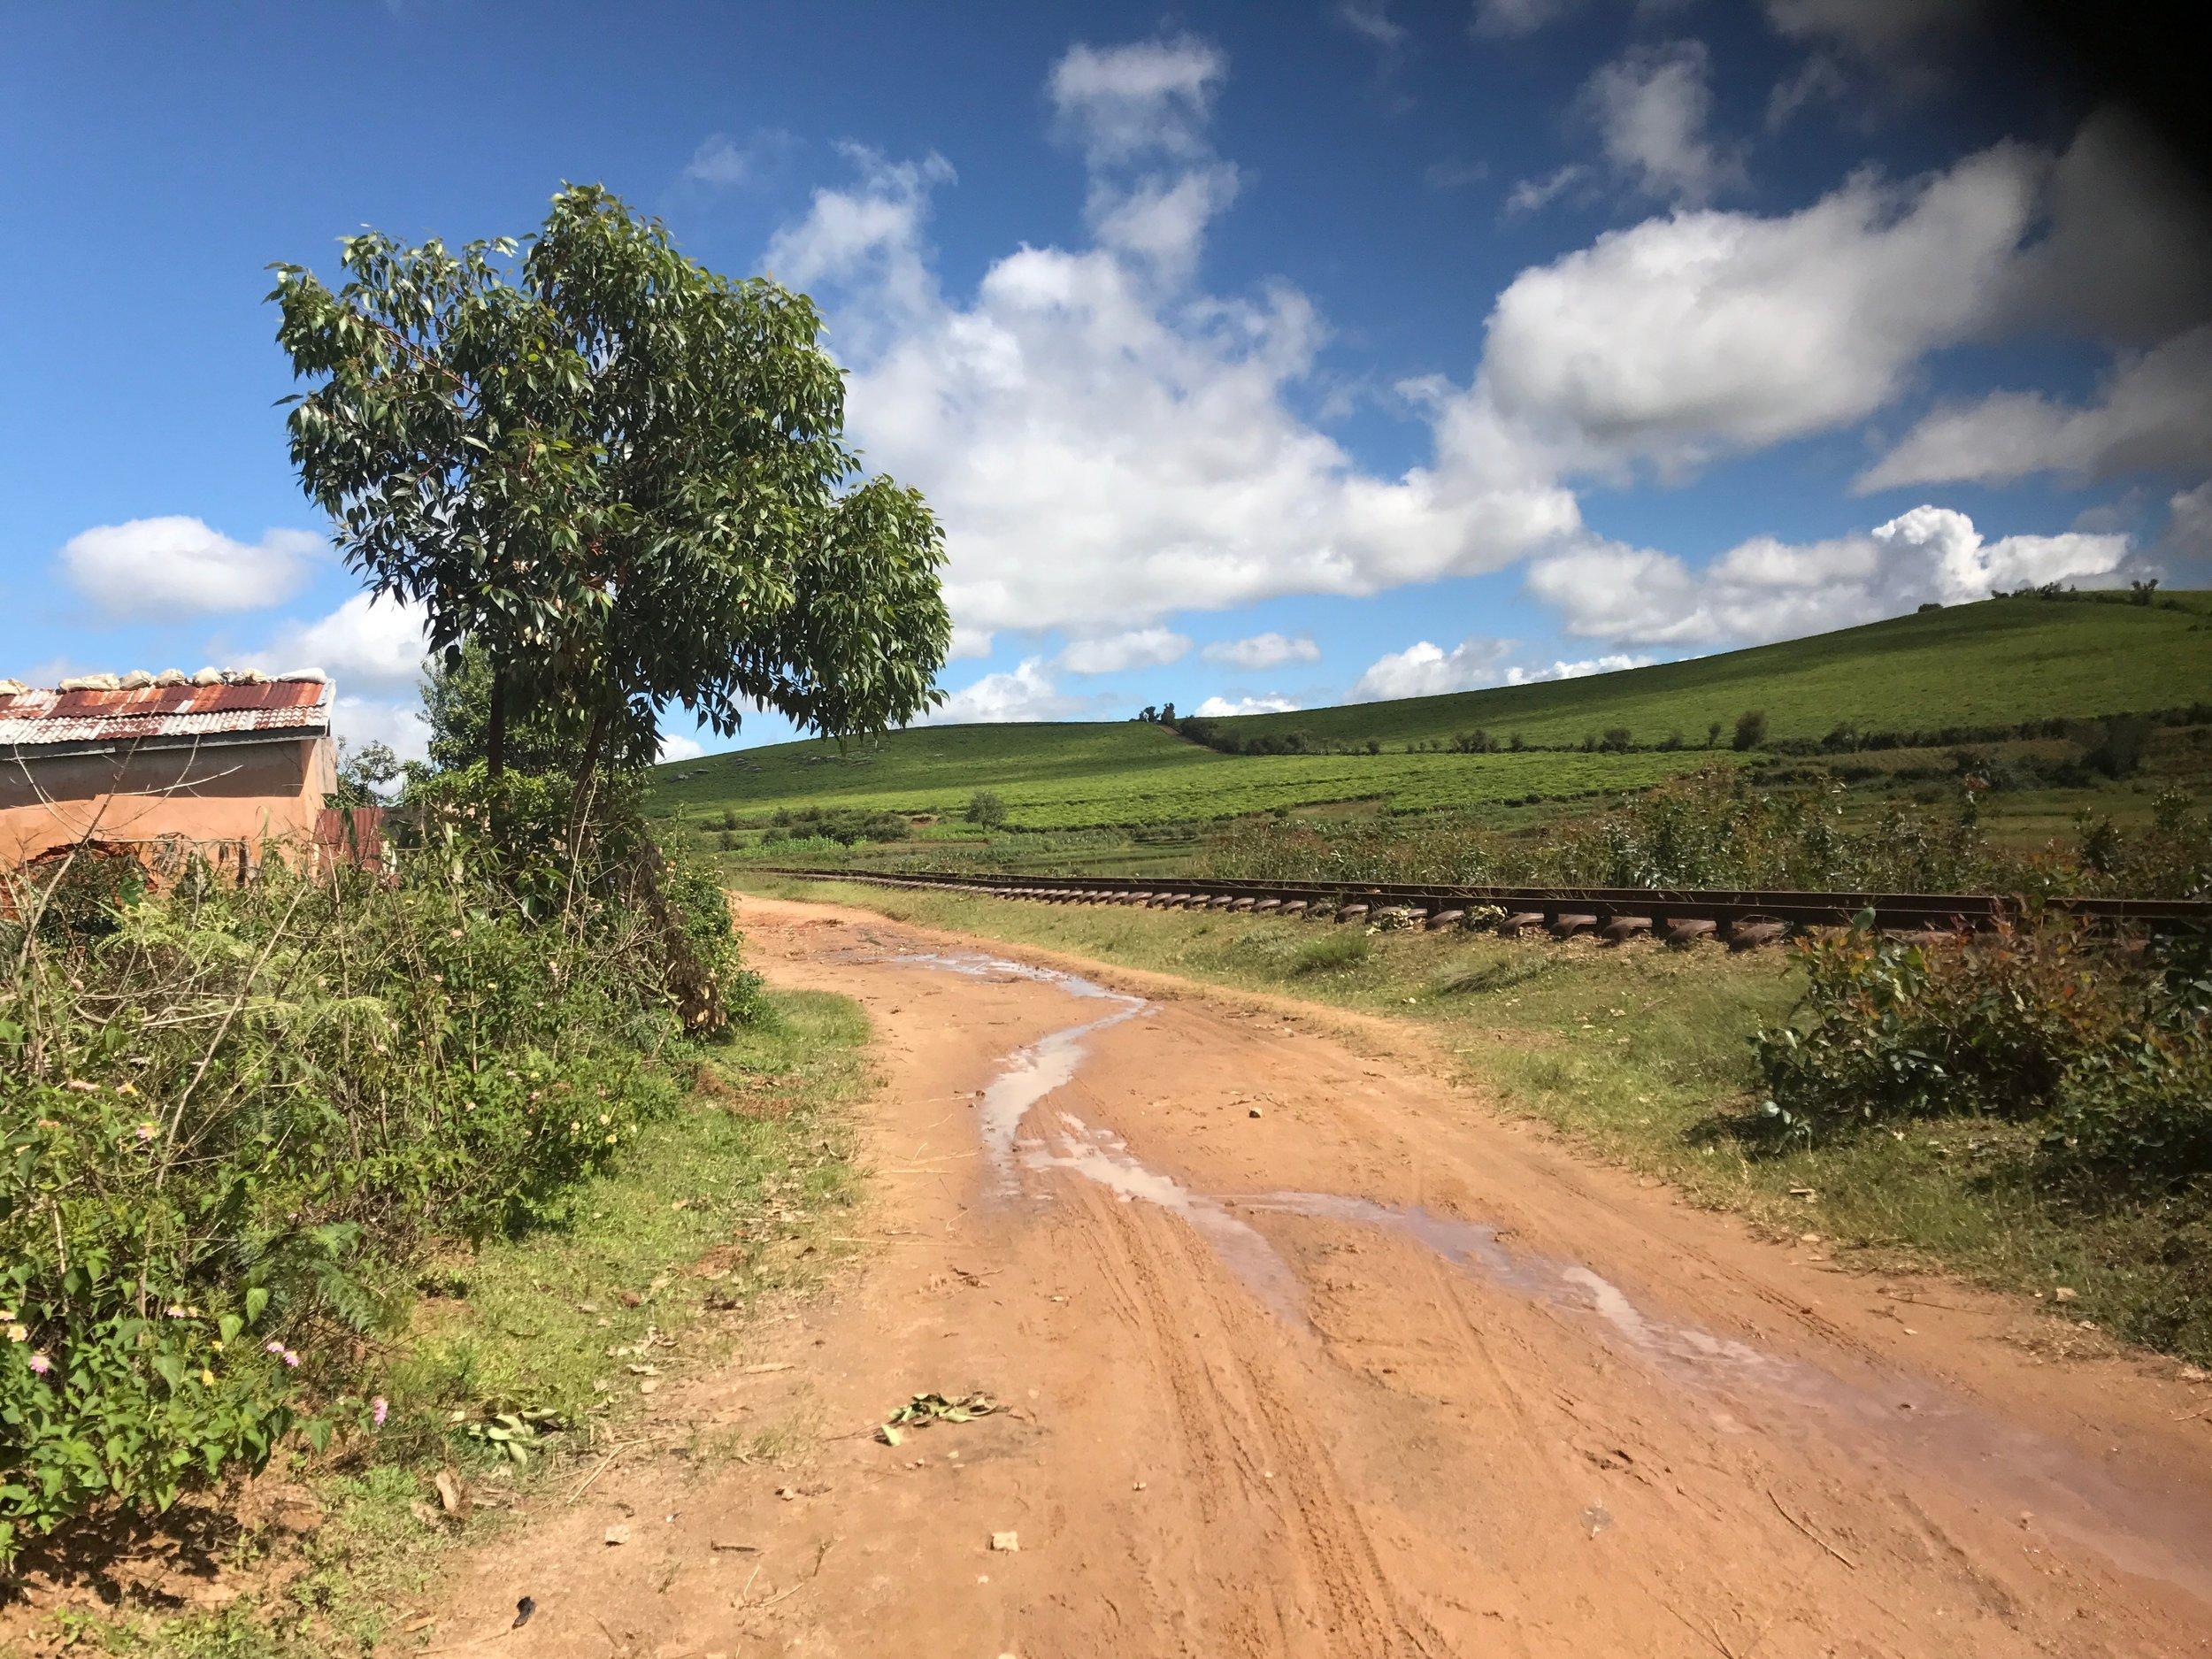 Bike path to the CEG...